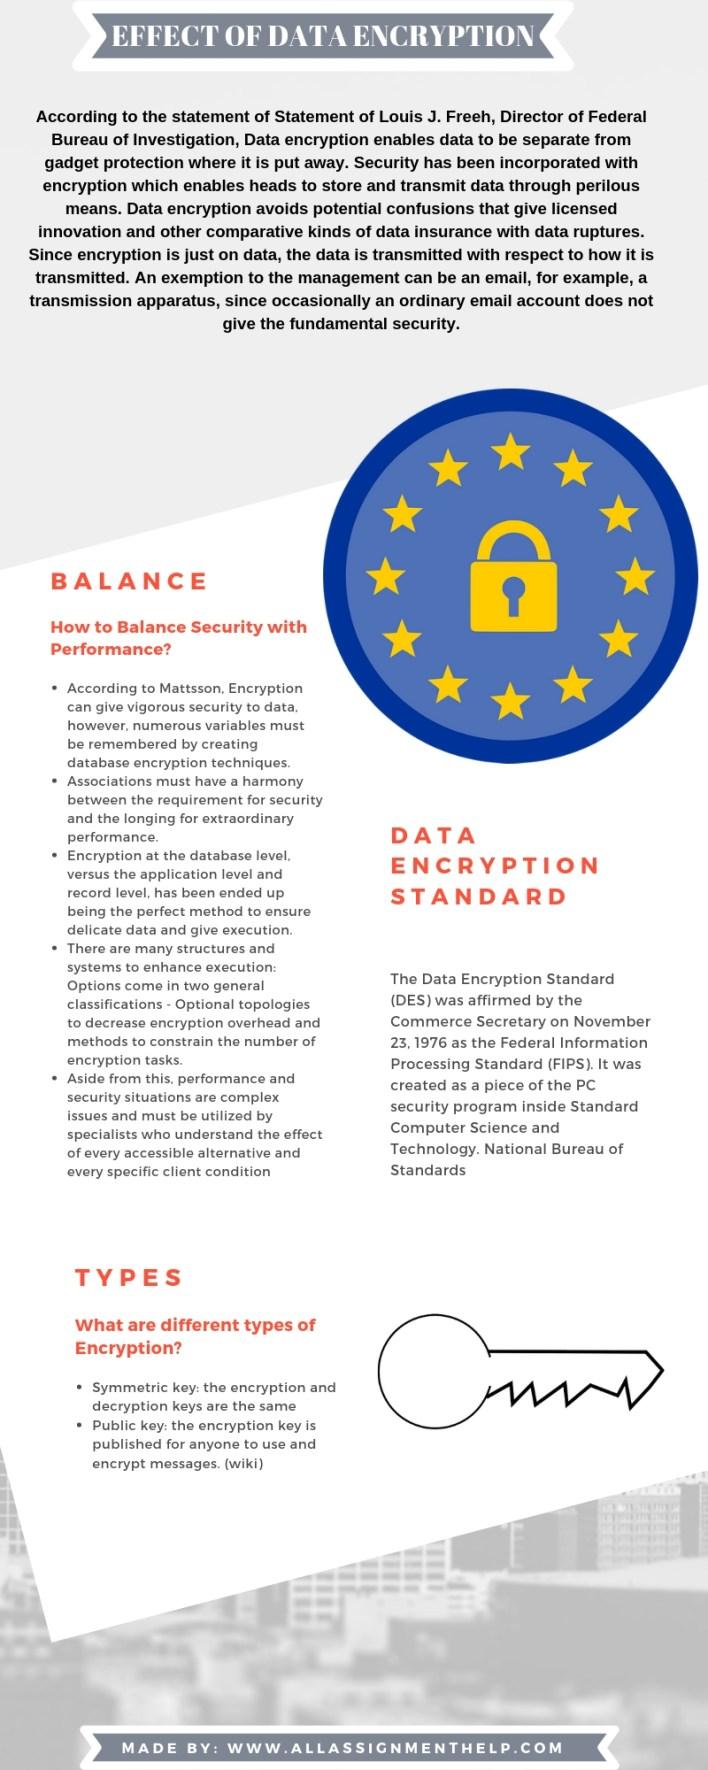 EFFECT OF DATA ENCRYPTION